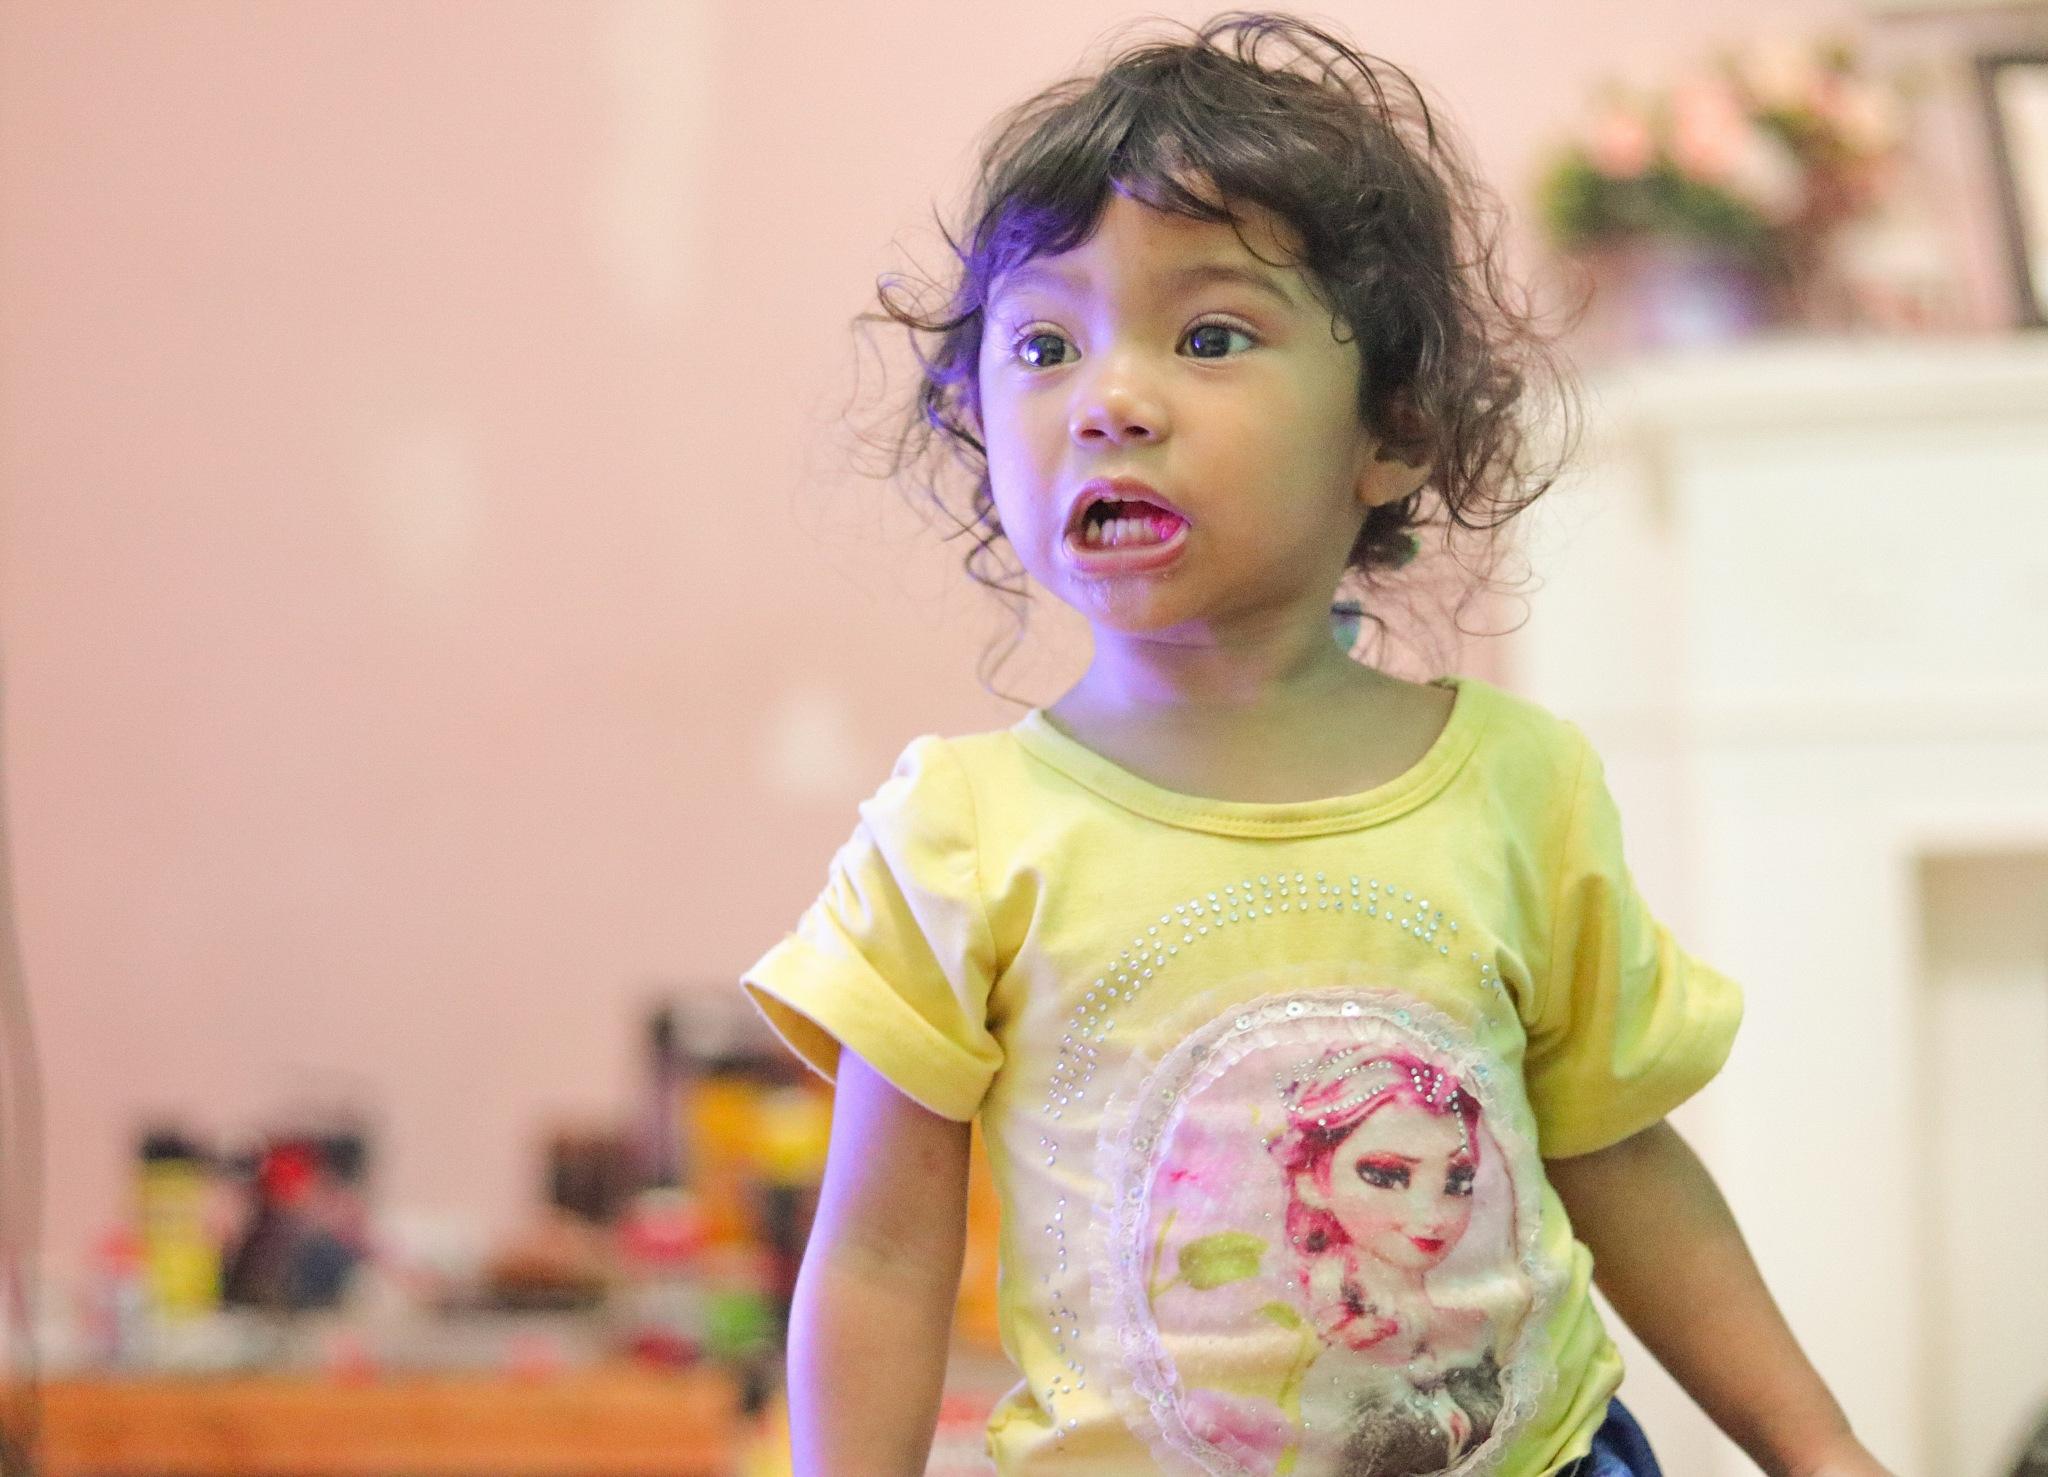 My Daughter.. by Aditya Dwi Ramdhani